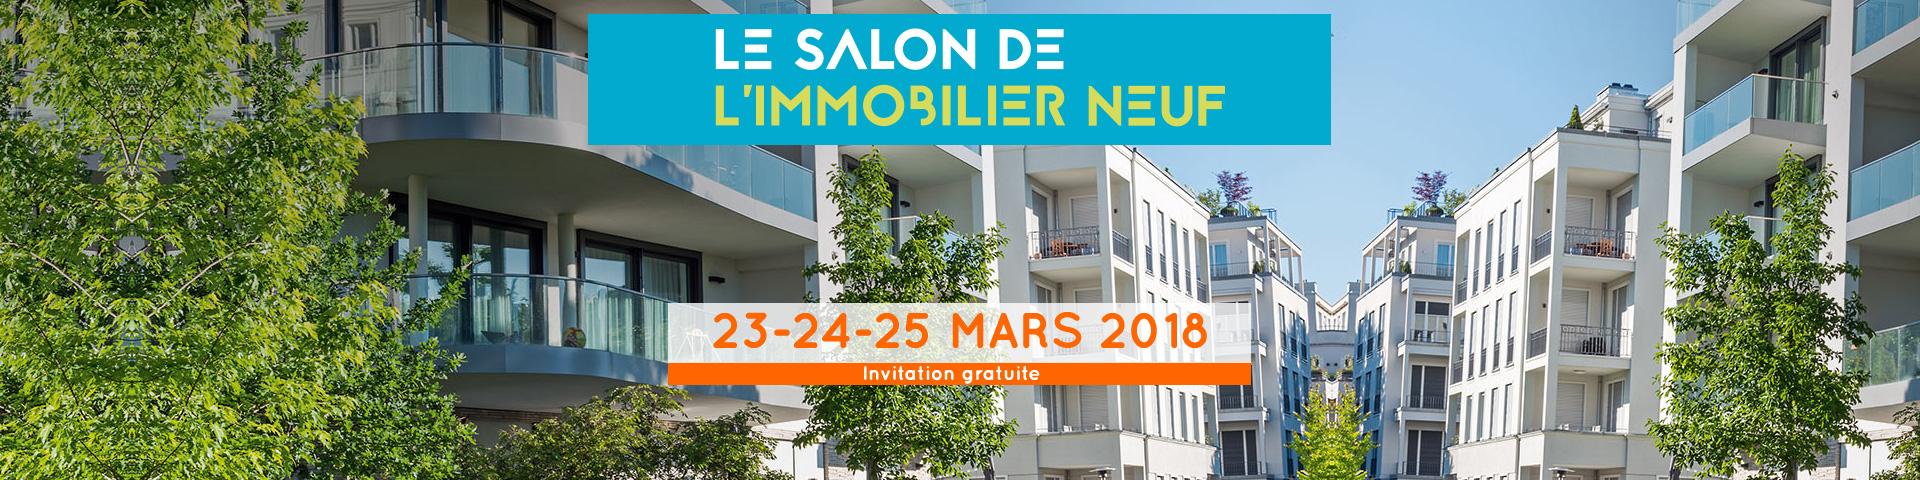 Br ves st phane plaza for Salon immobilier toulouse